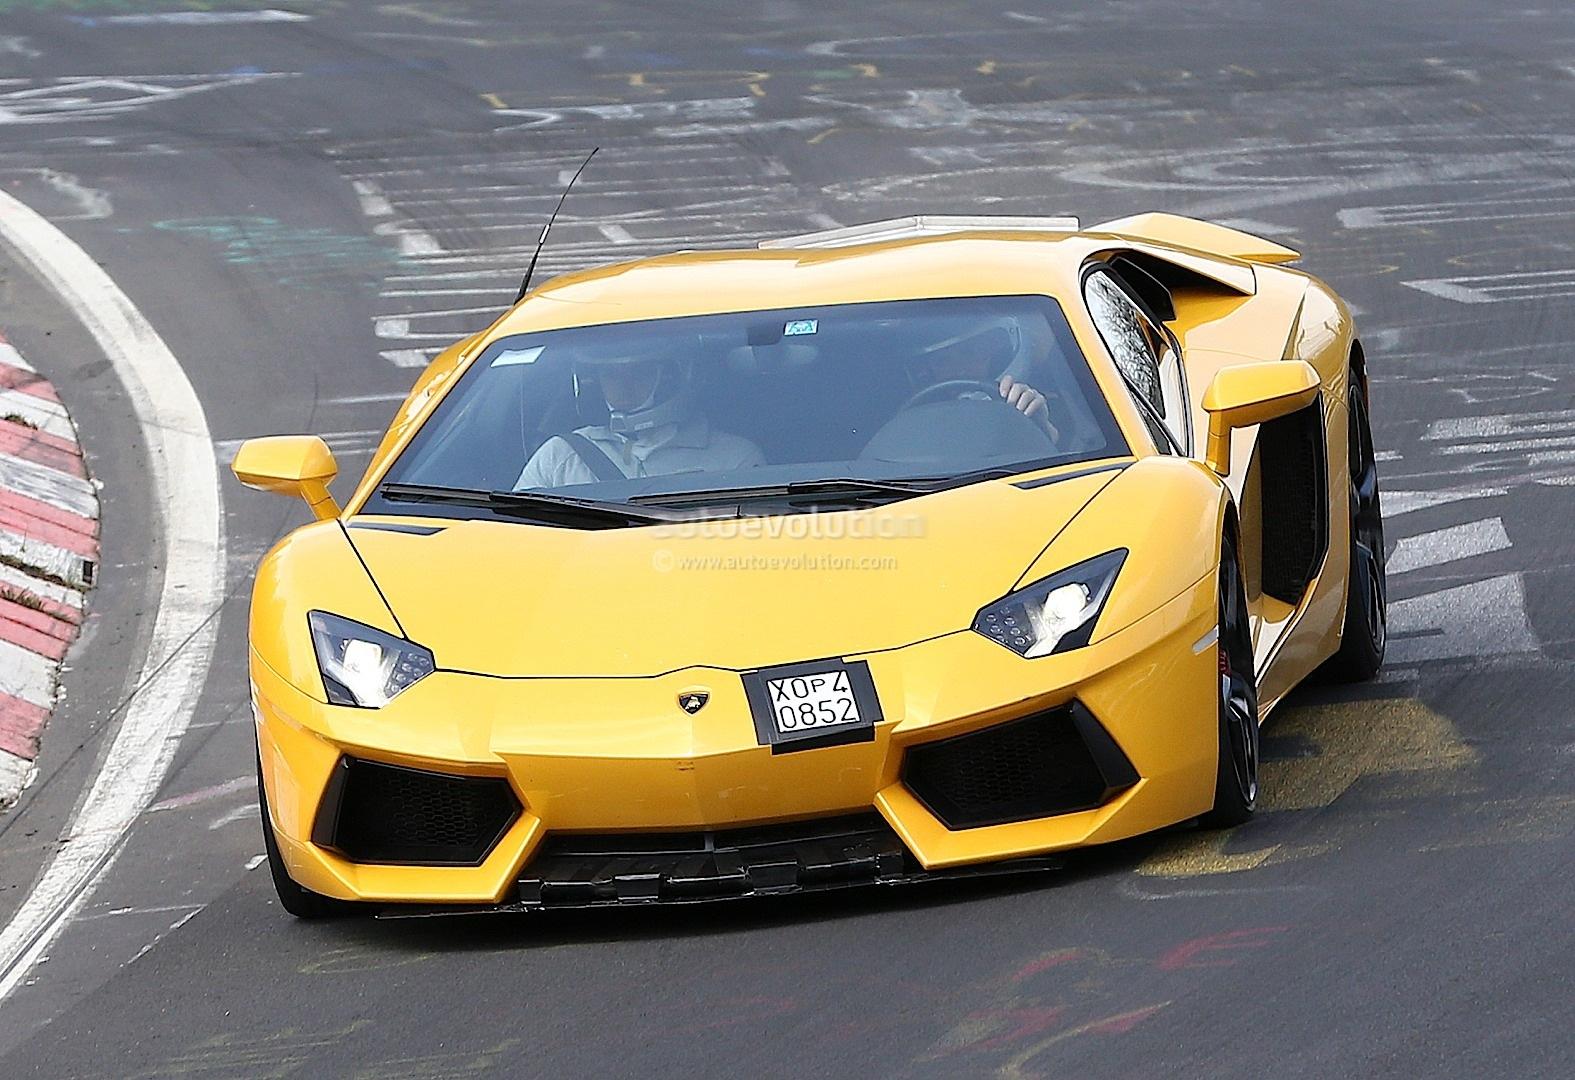 Spyshots: 2015 Lamborghini Aventador SV - autoevolution